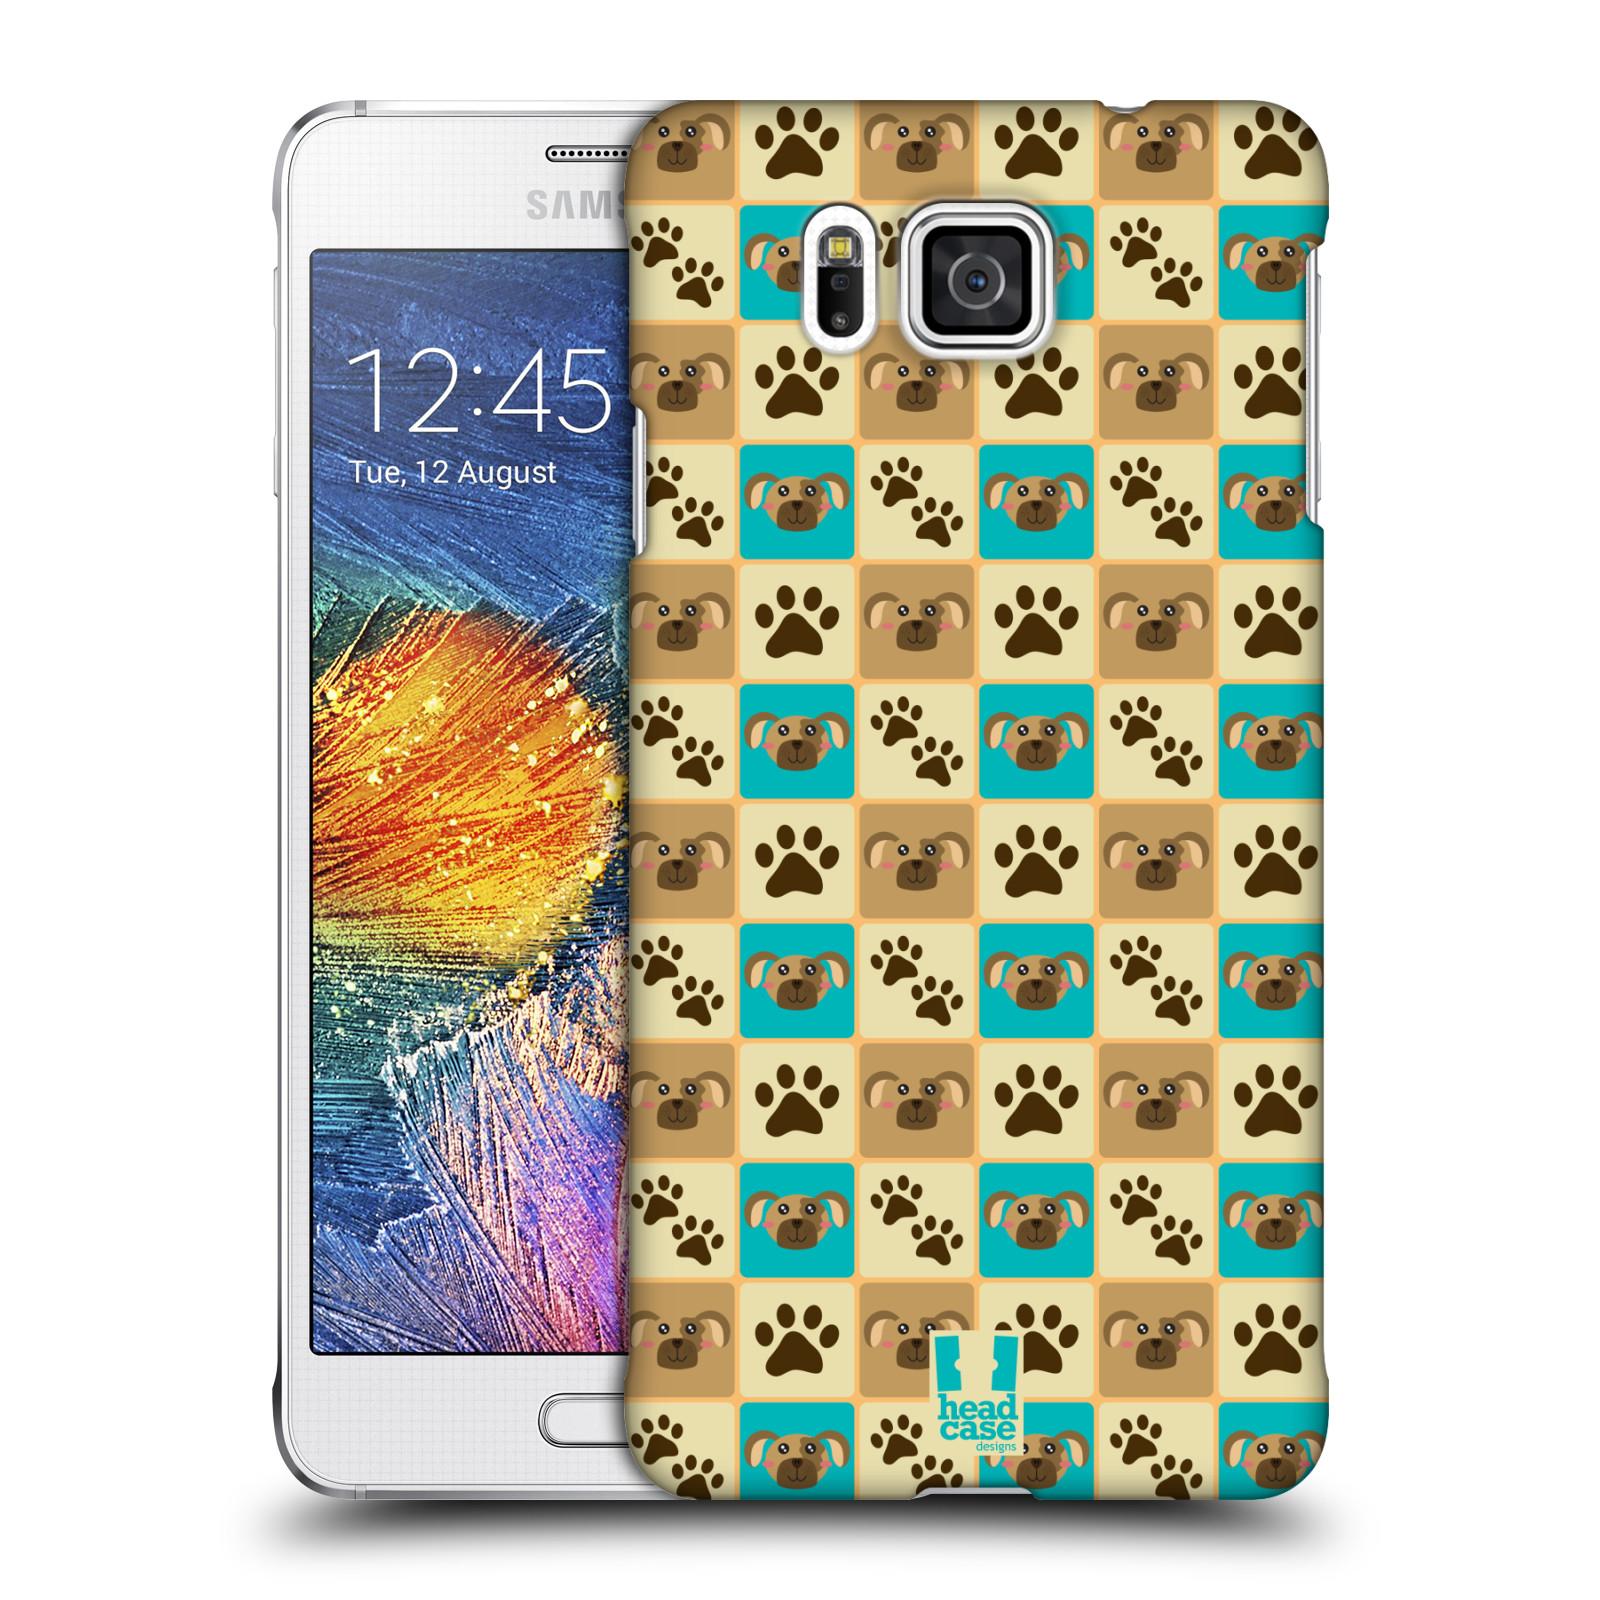 HEAD CASE plastový obal na mobil SAMSUNG Galaxy Alpha (G850) vzor Zvířecí razítka PSÍ TLAPKA